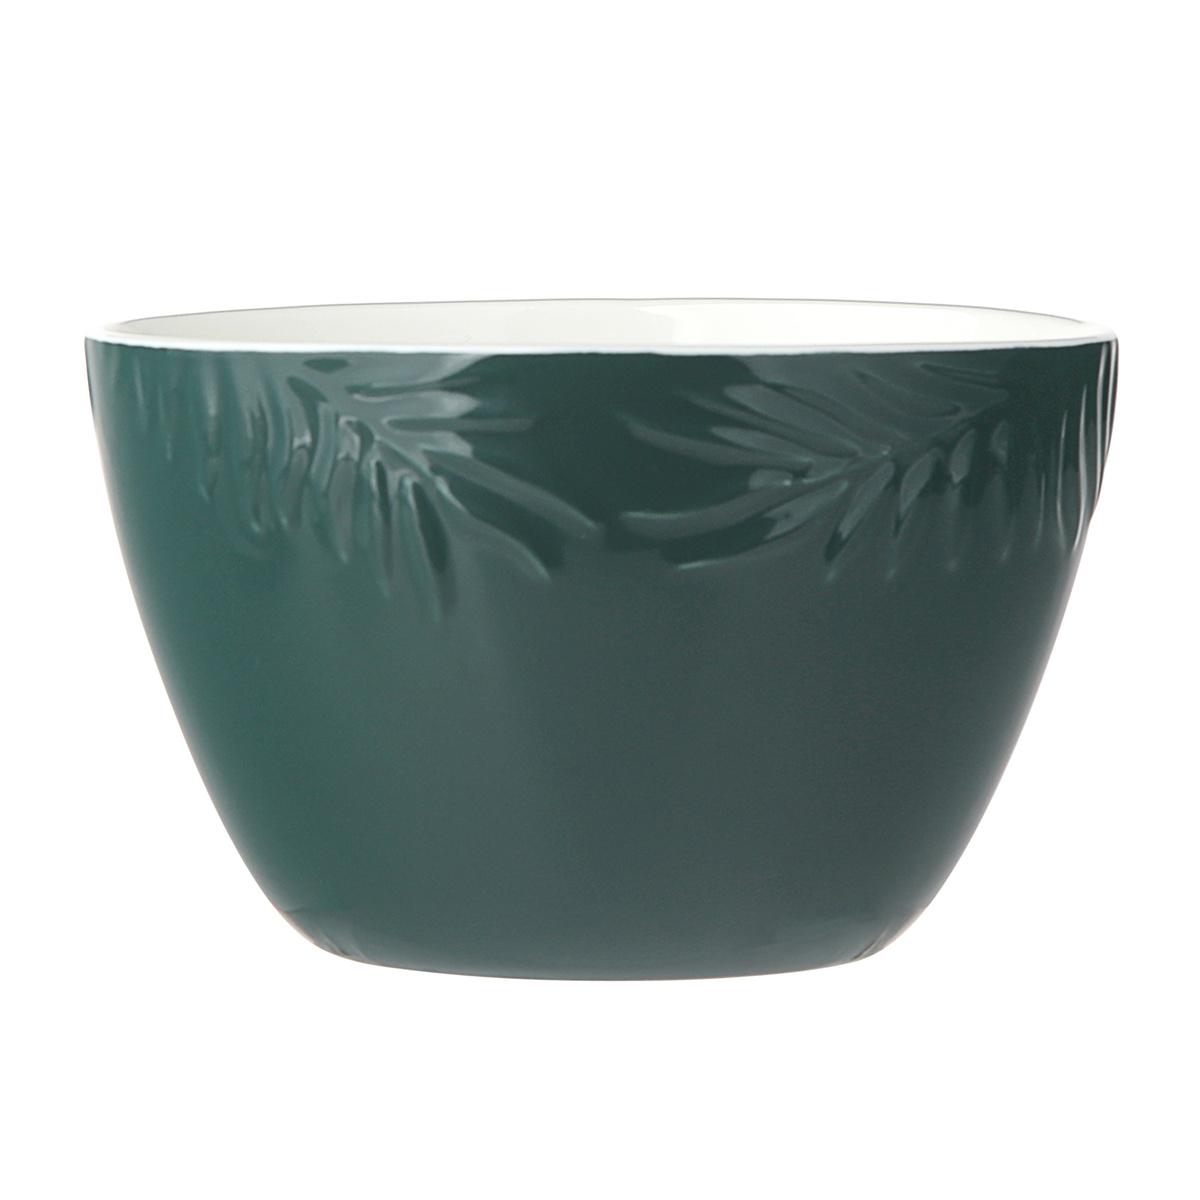 Altom Porcelánová miska Tropical, 14 cm, zelená